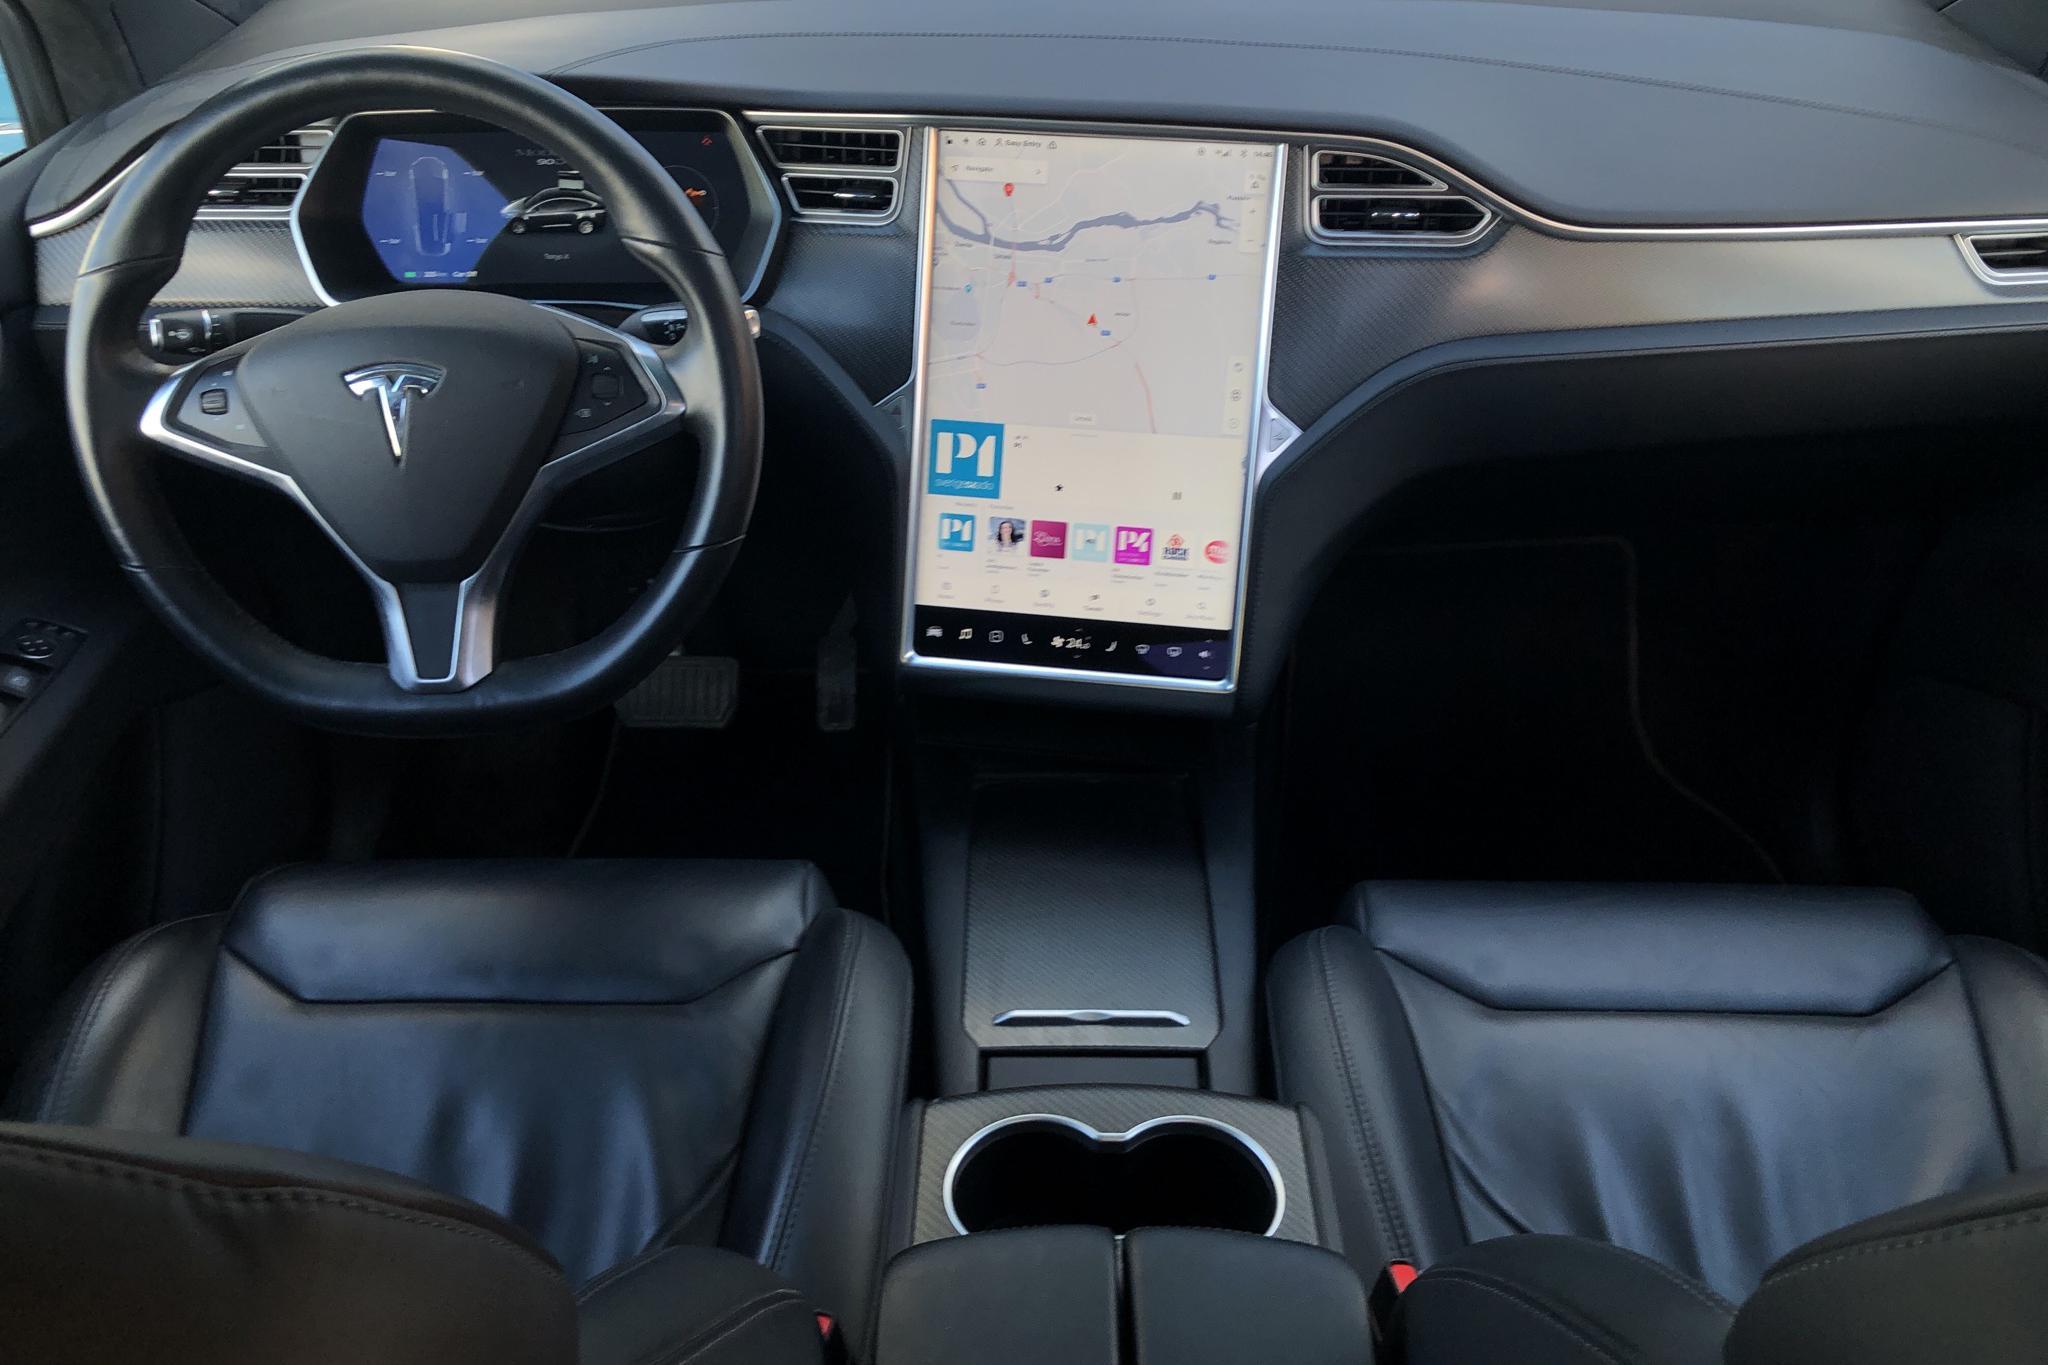 Tesla Model X 90D - 137 560 km - Automatic - gray - 2017